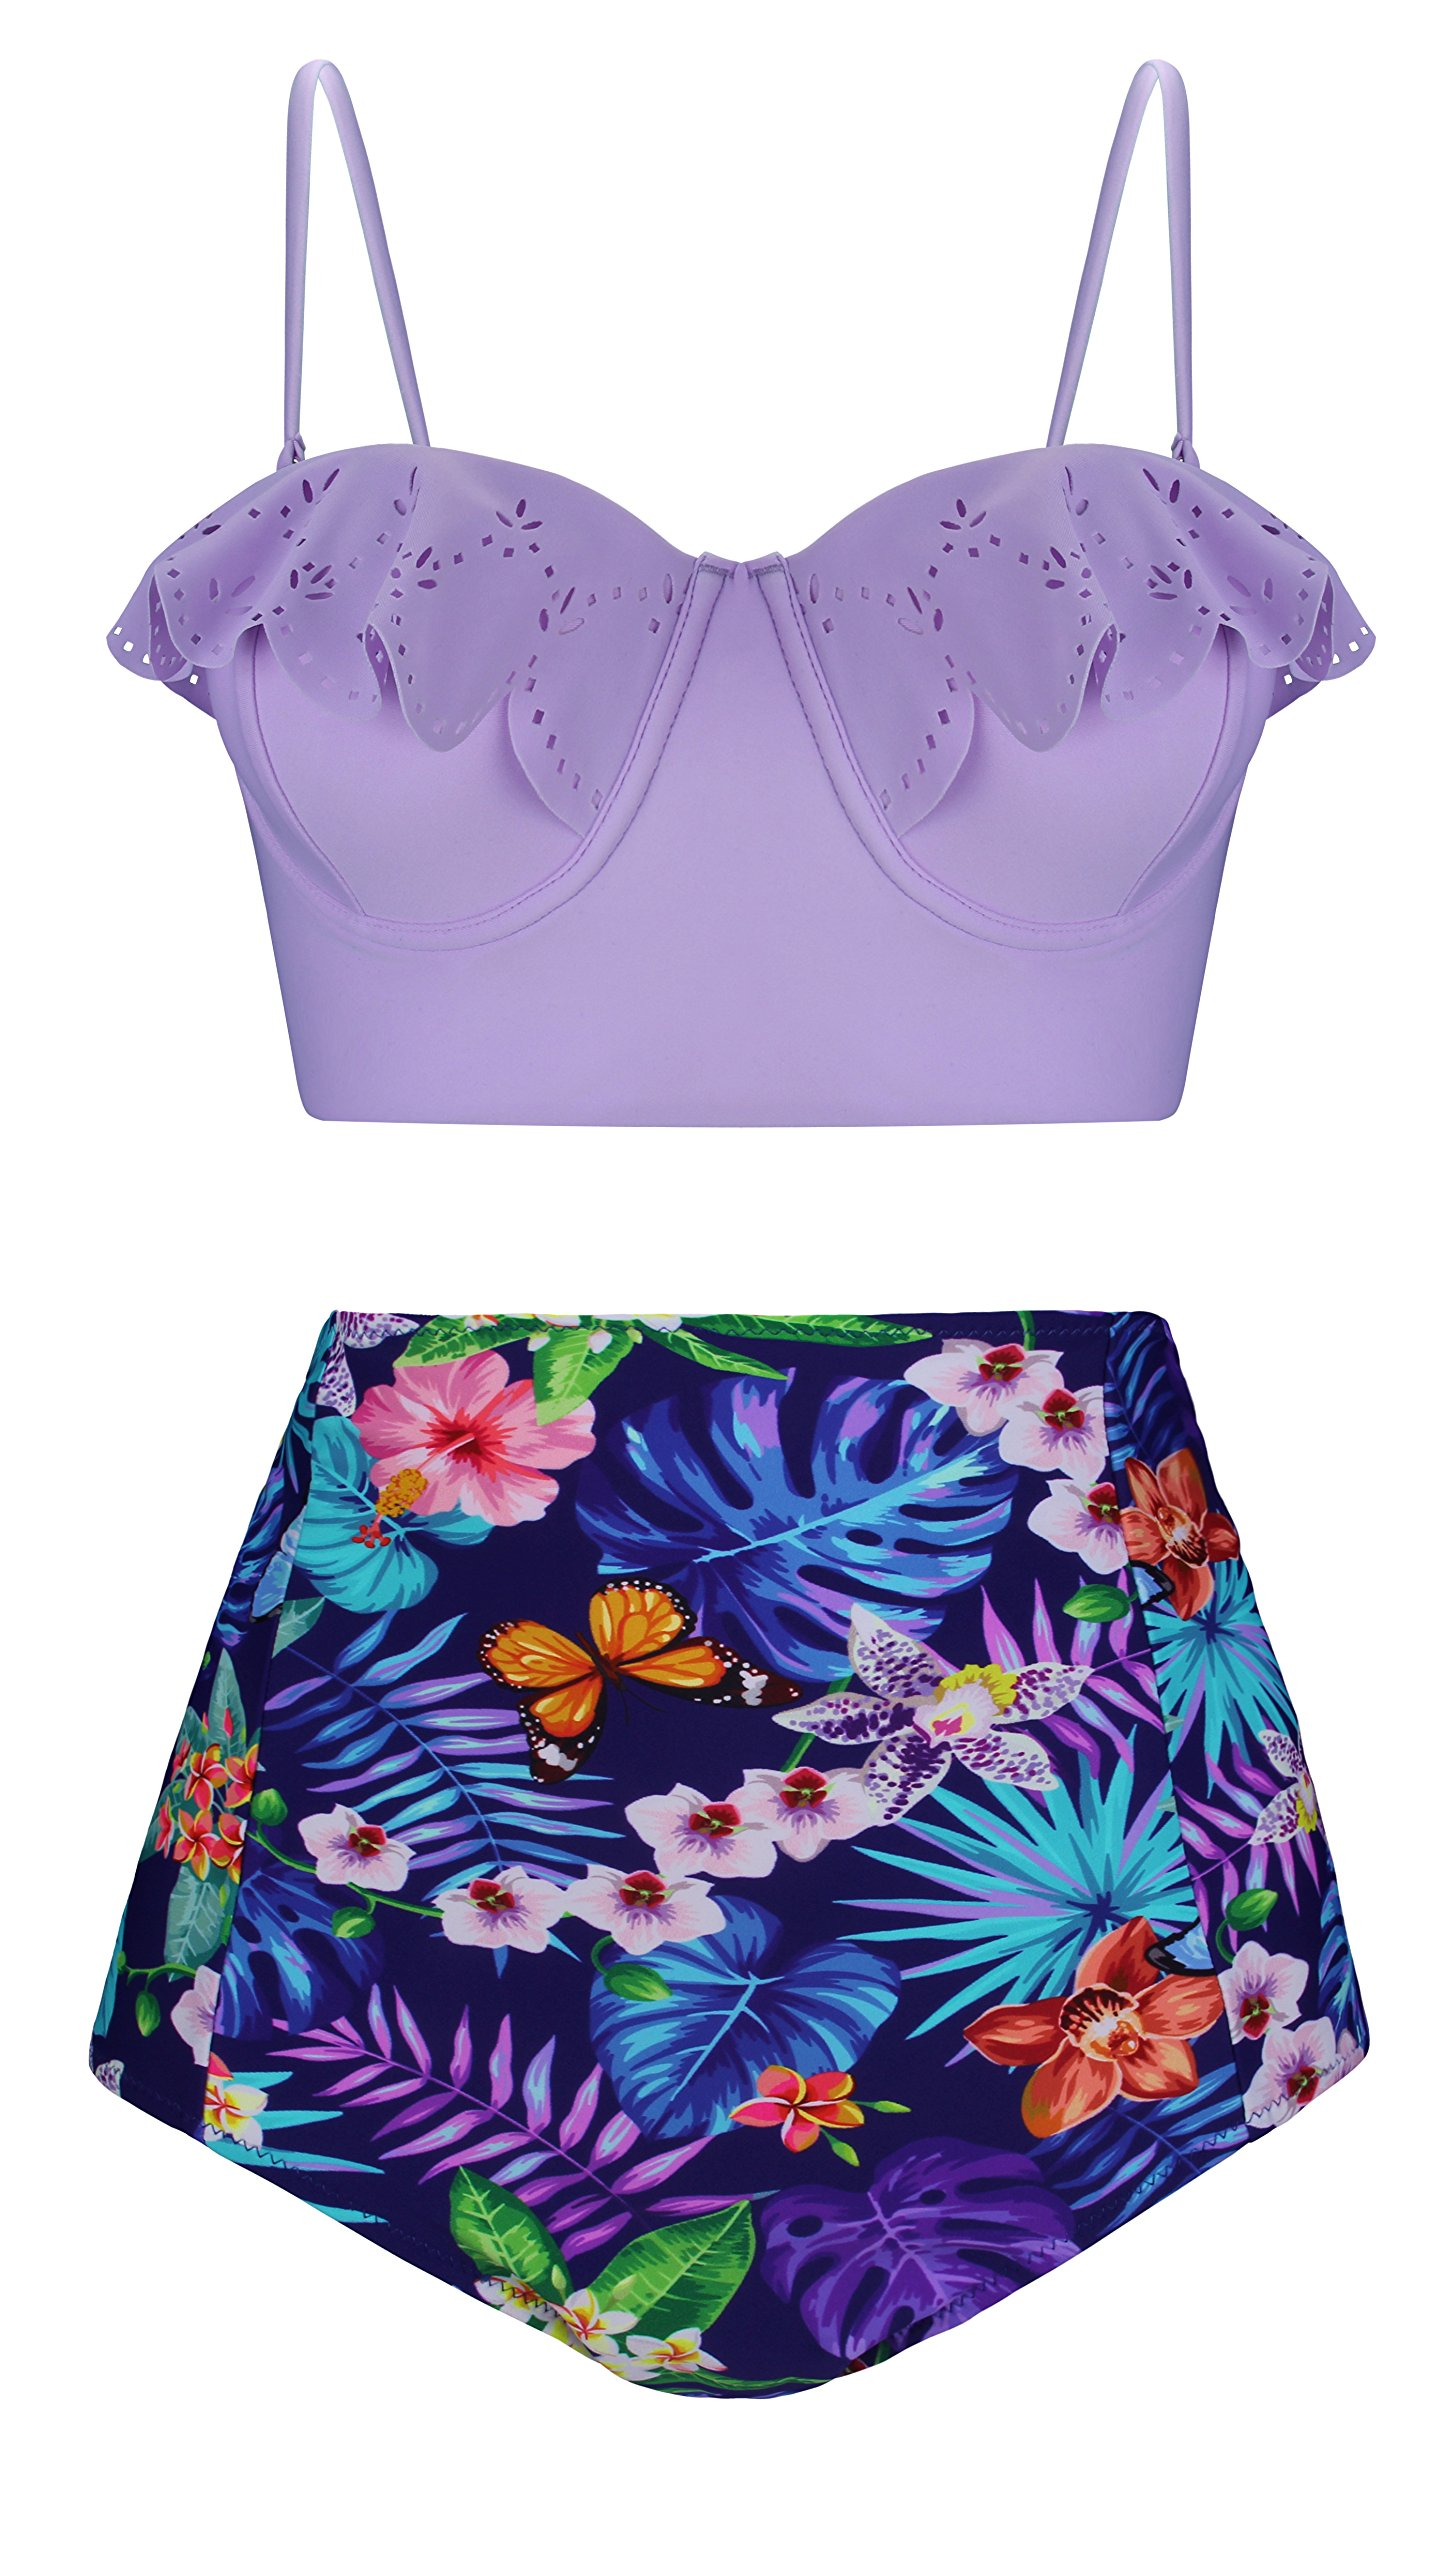 Angerella Ruffled Top Bikini Retro Vintage Style Two Piece Swimsuits High Waisted Bikini Bottom Purple,2XL